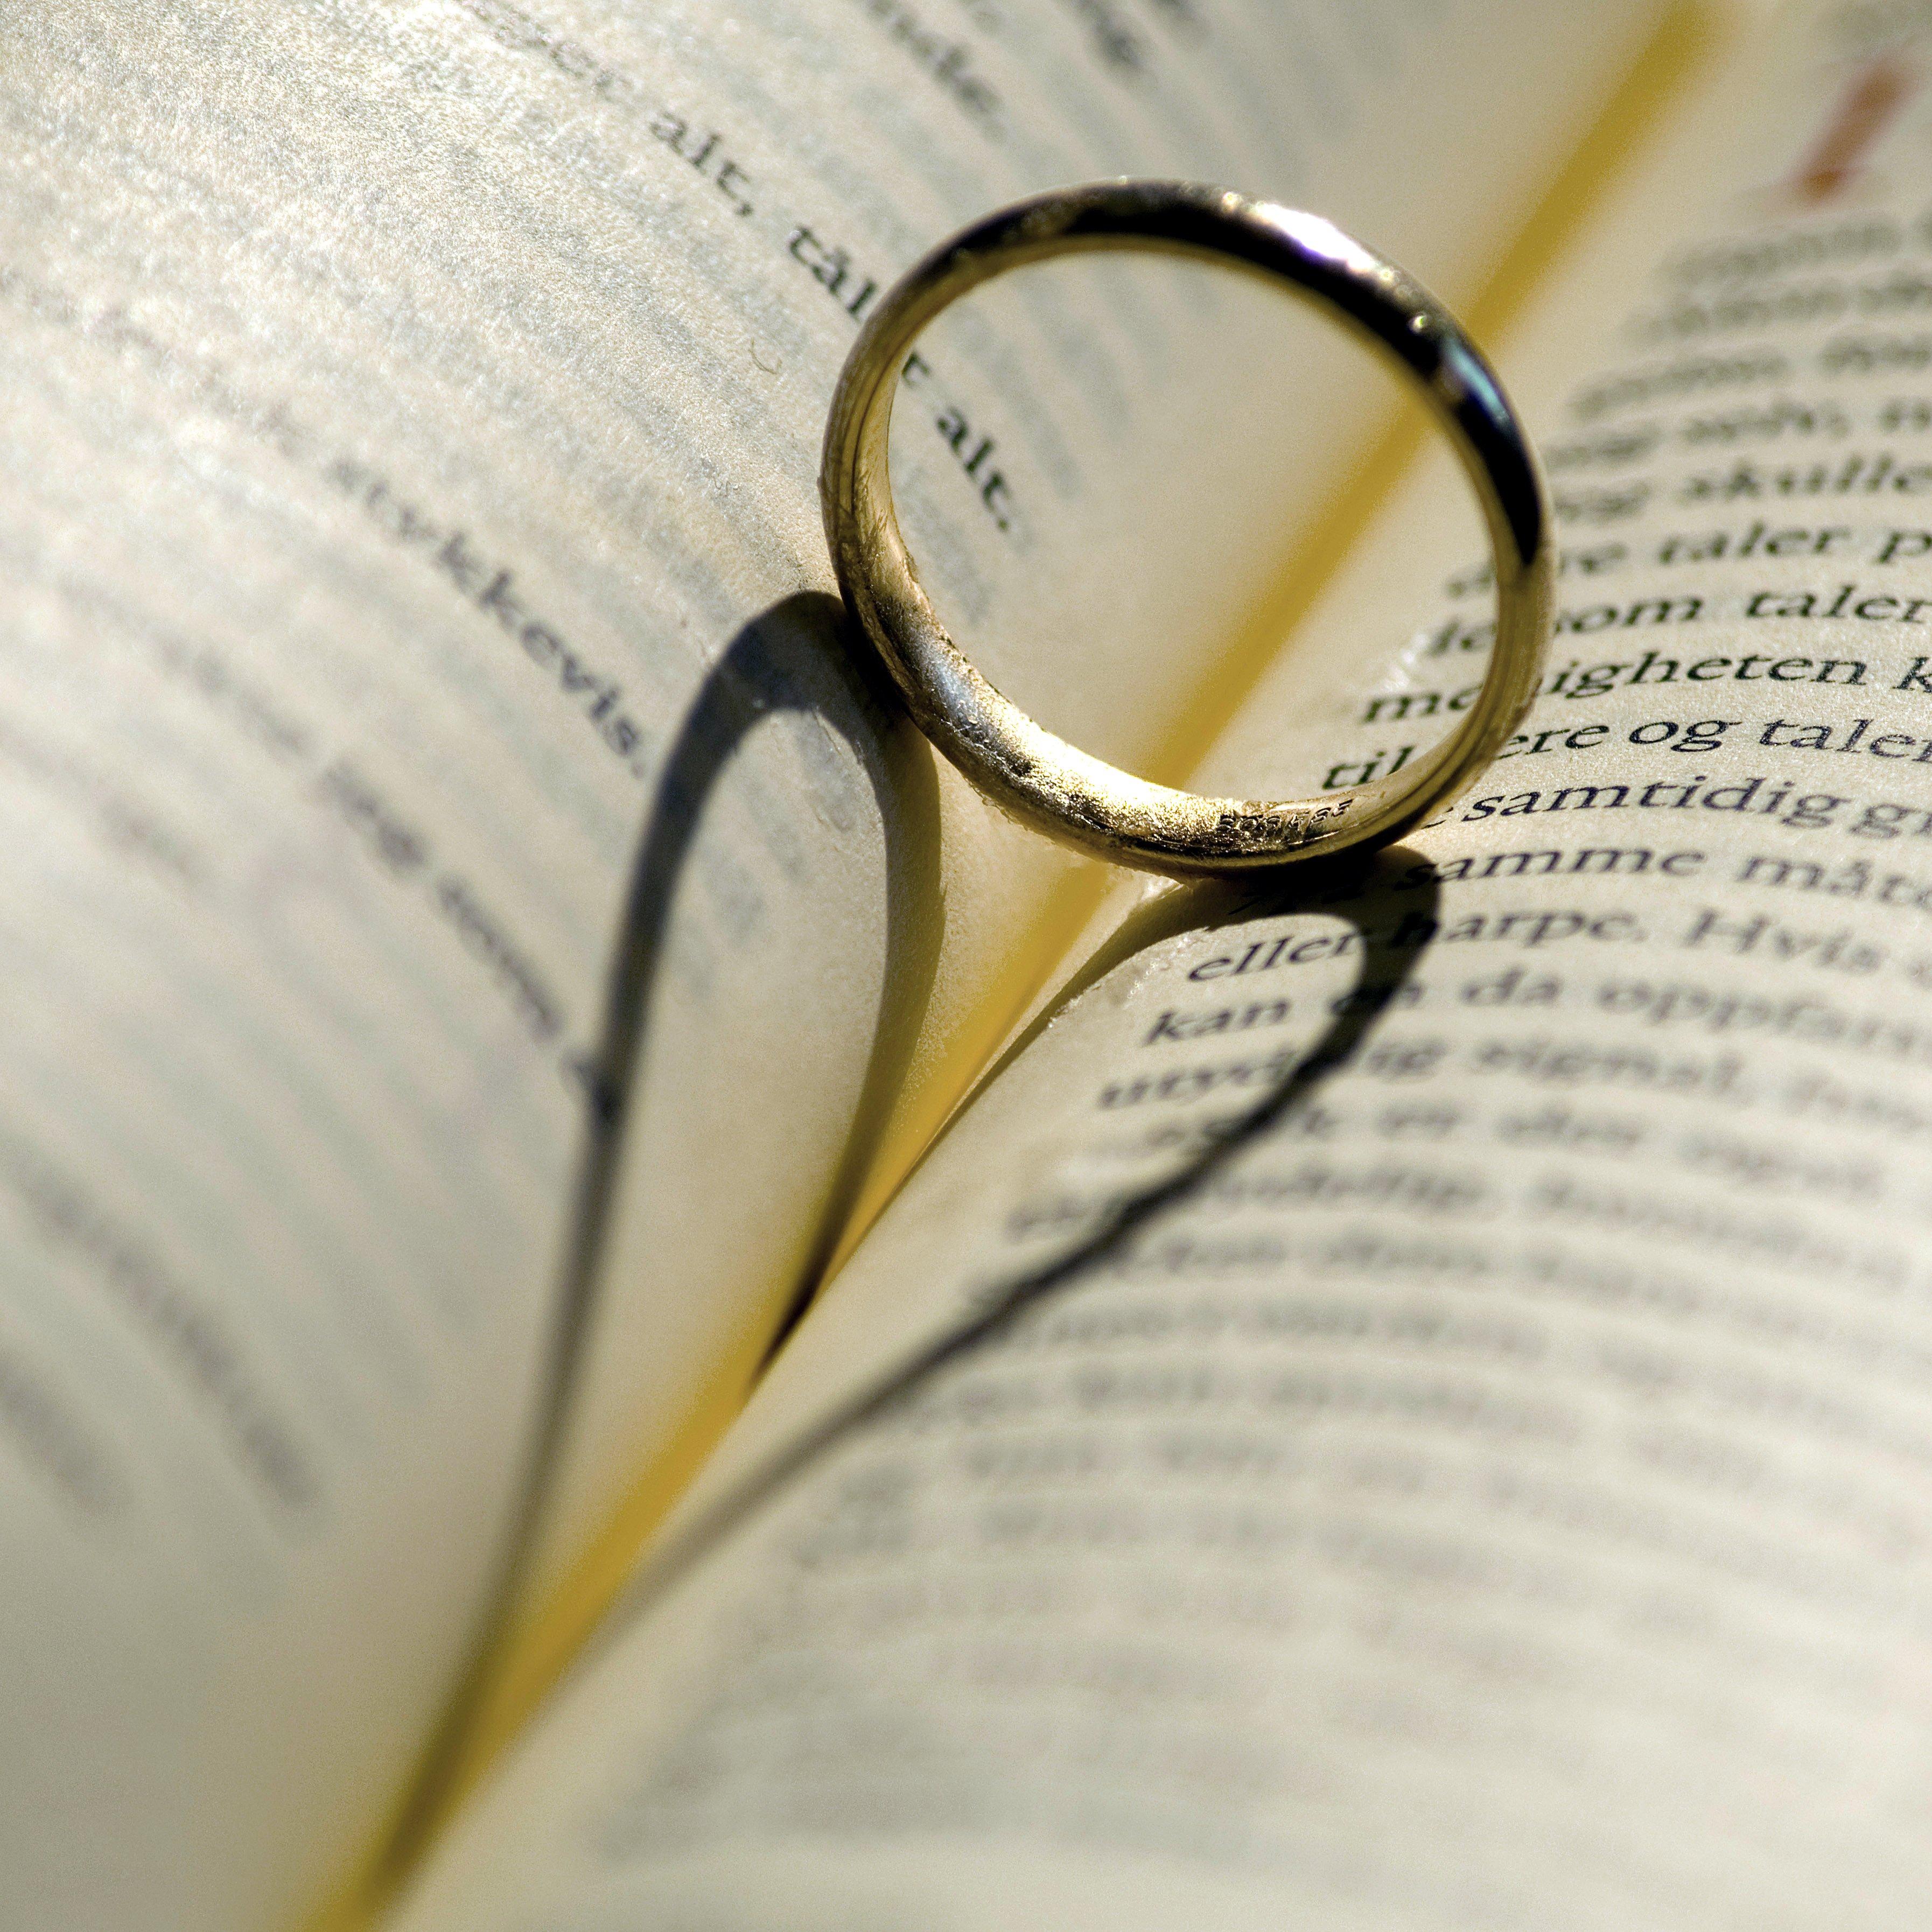 A precursor to bringing grace Marriage